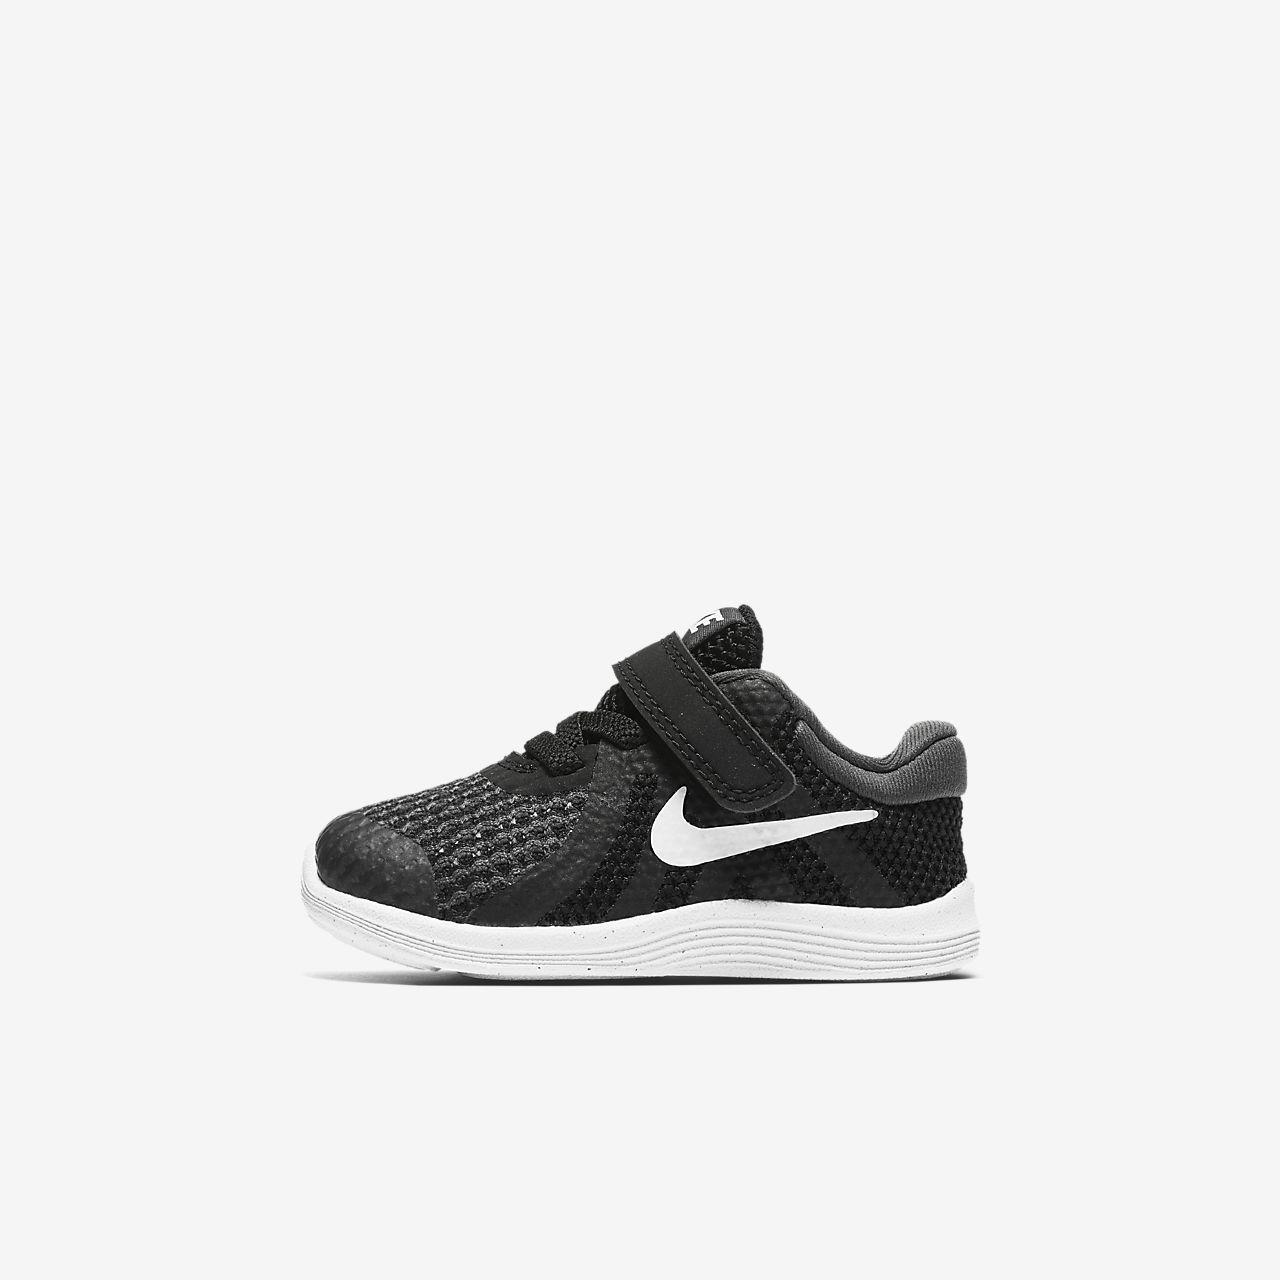 Top Nike Gr 26 27 28 17 cm Revolution 3 Schuhe Turnschuhe